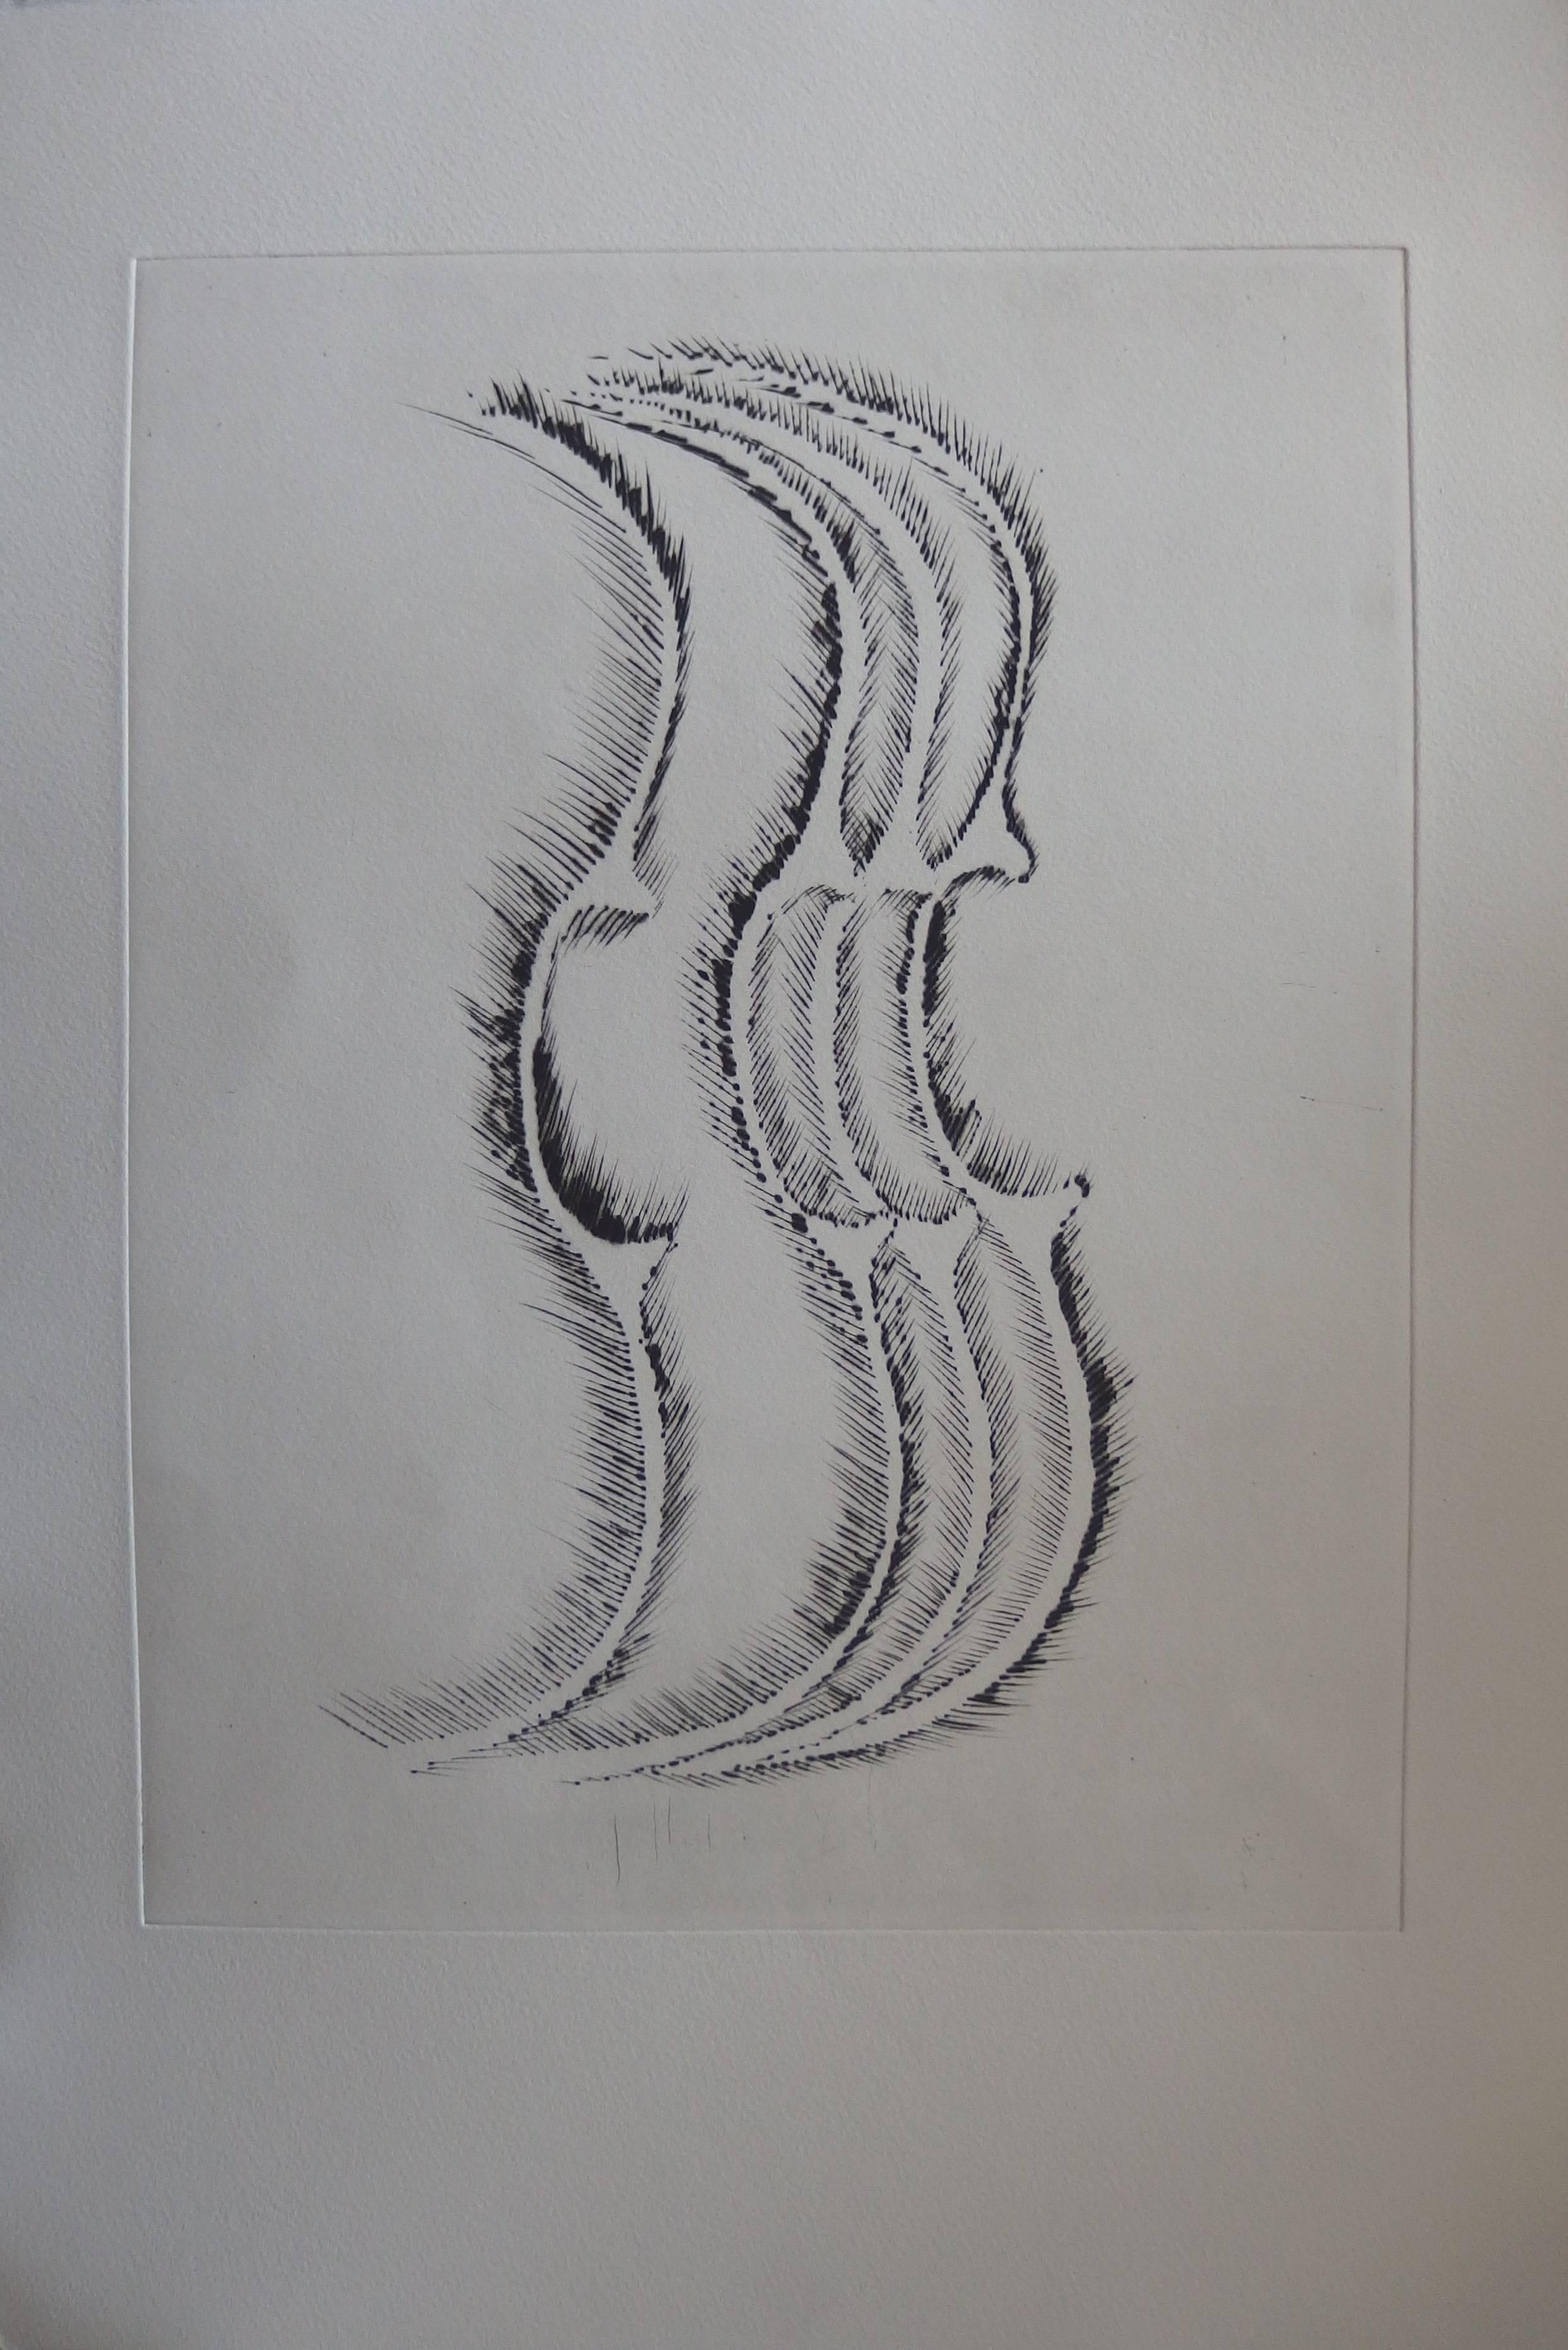 Violin profile - Original etching - 75 copies